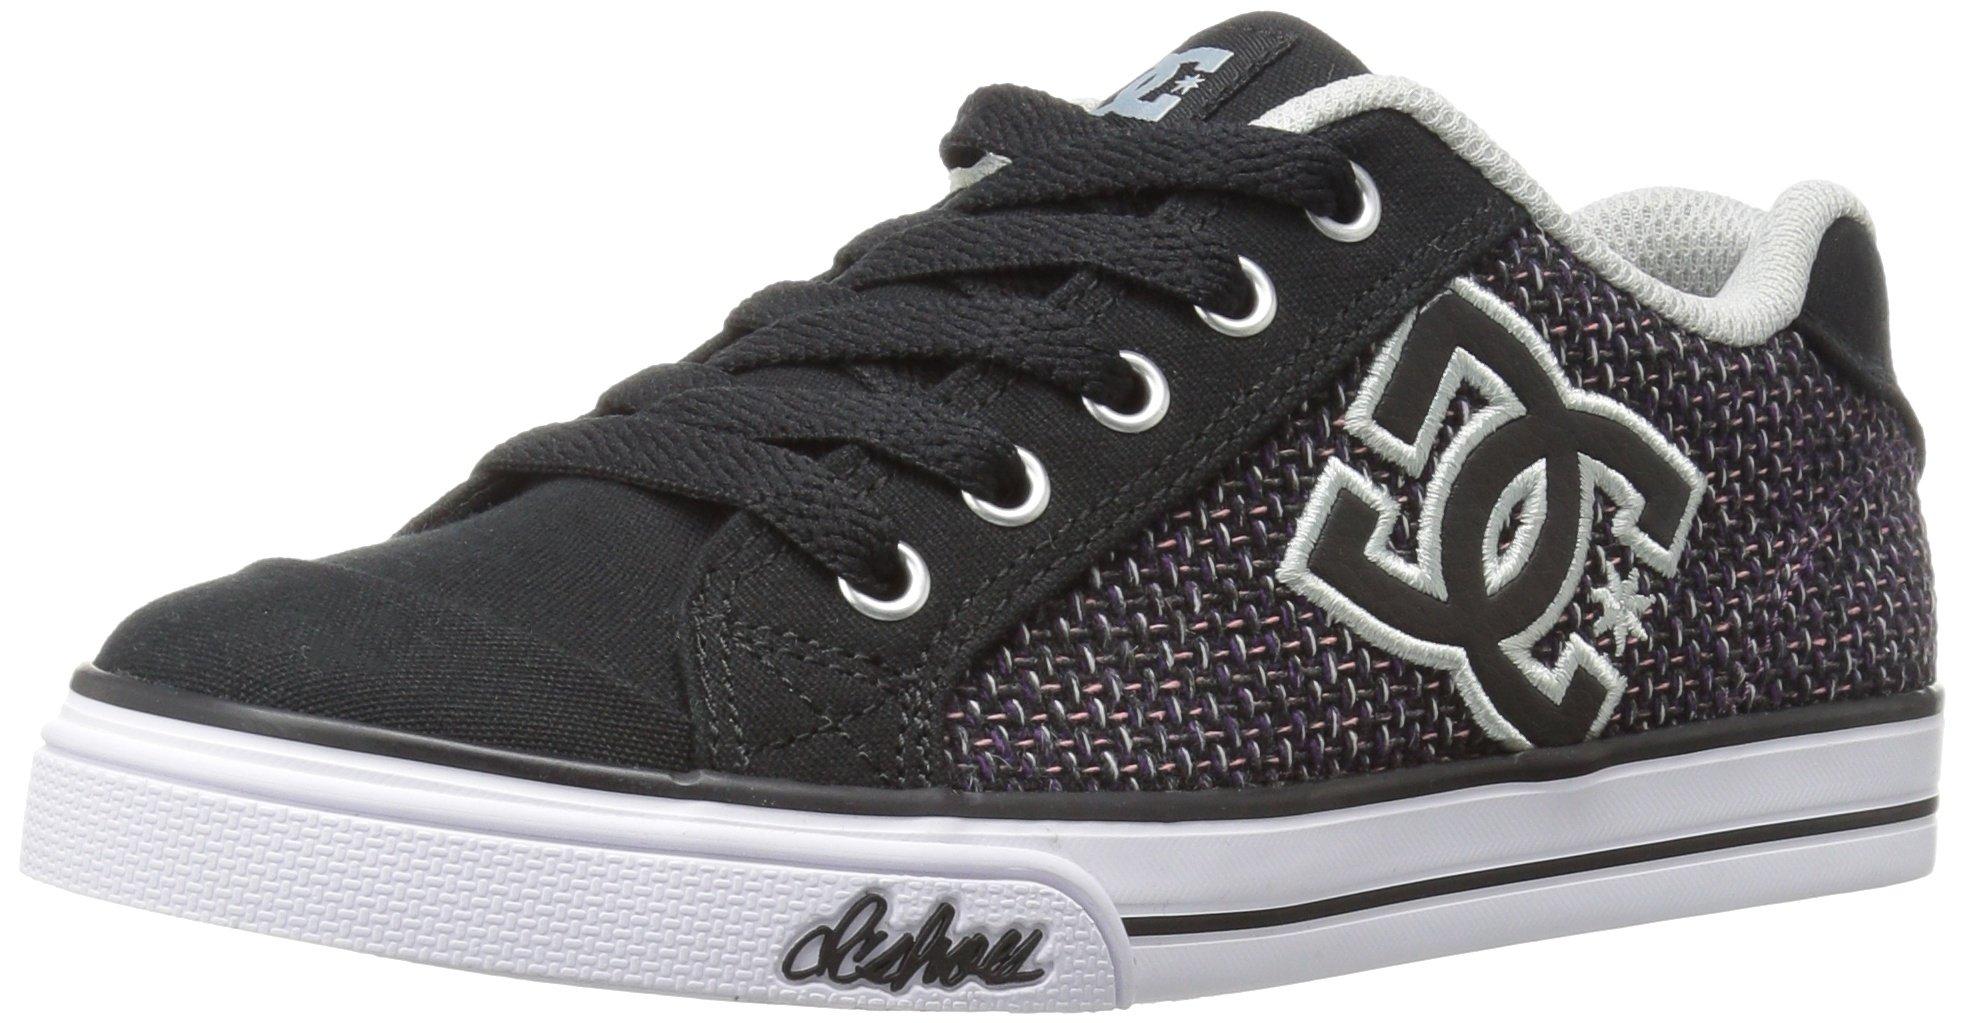 DC Girls Youth Chelsea SE Skate Shoes Sneaker, Black/White/Pink, 1.5 M US Little Kid